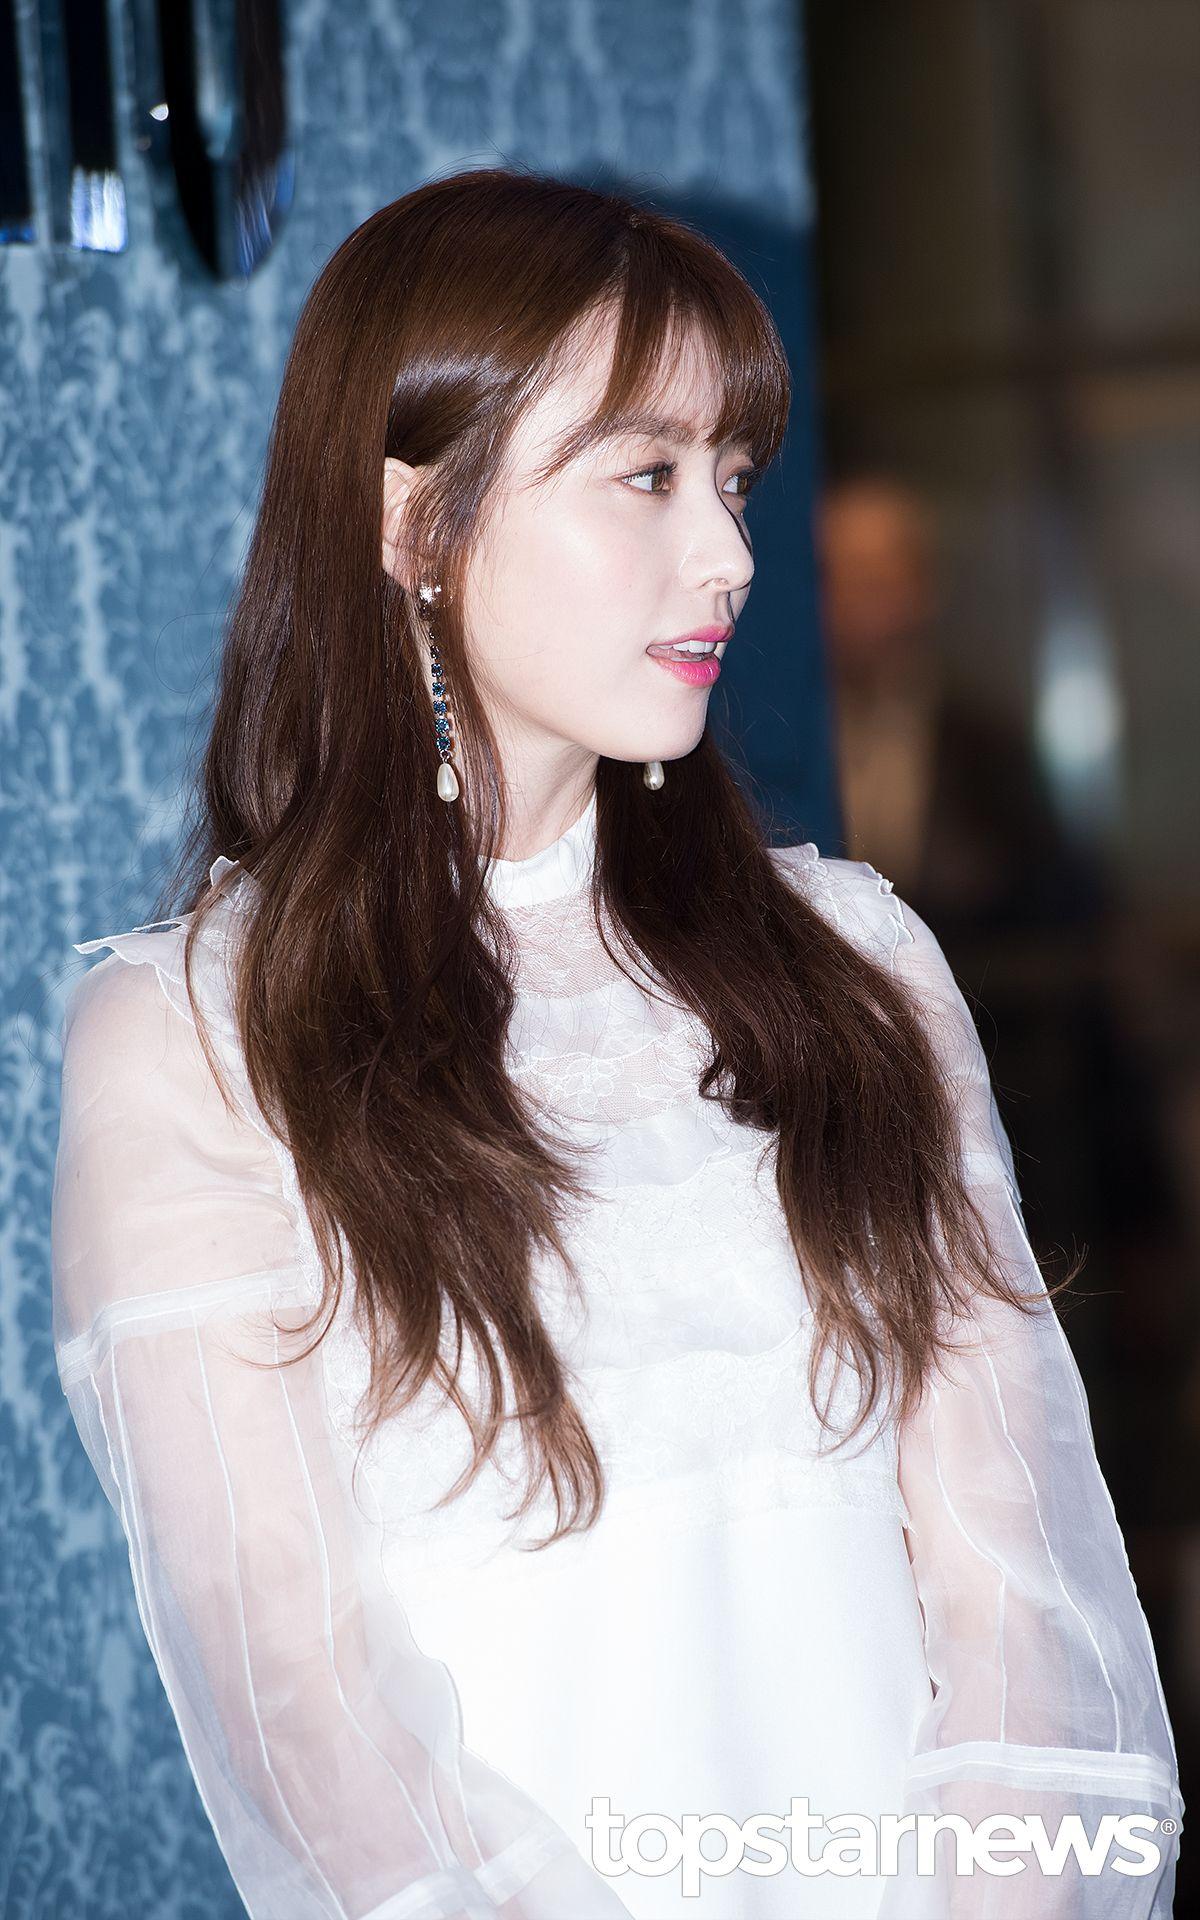 Korean Celebs Street Fashion Trends Review: Han Hyo Joo, Korean Actresses